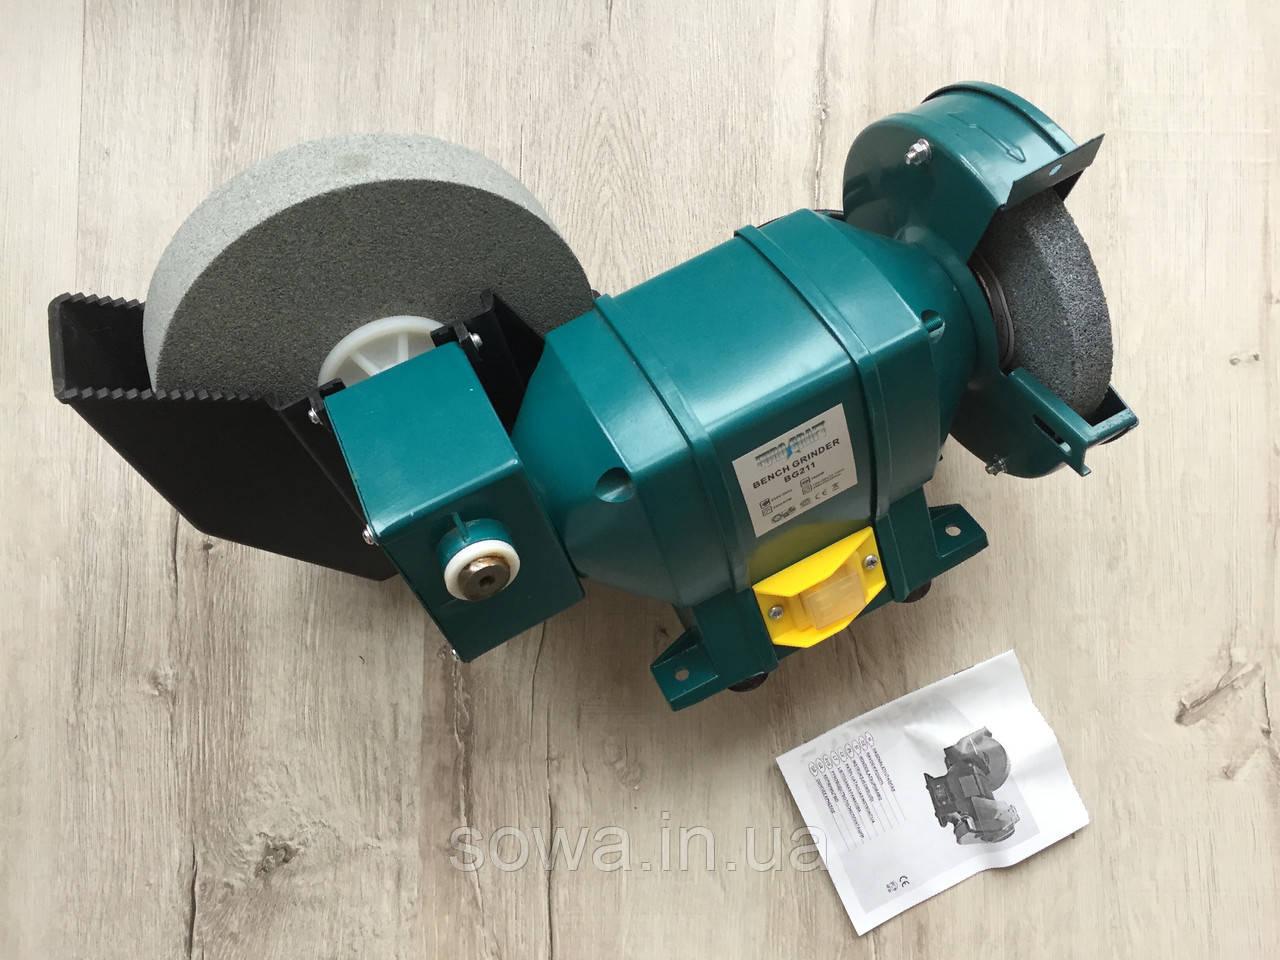 ✔️ Точильний верстат Euro Craft BG211 (1600Вт, 150-200мм коло )